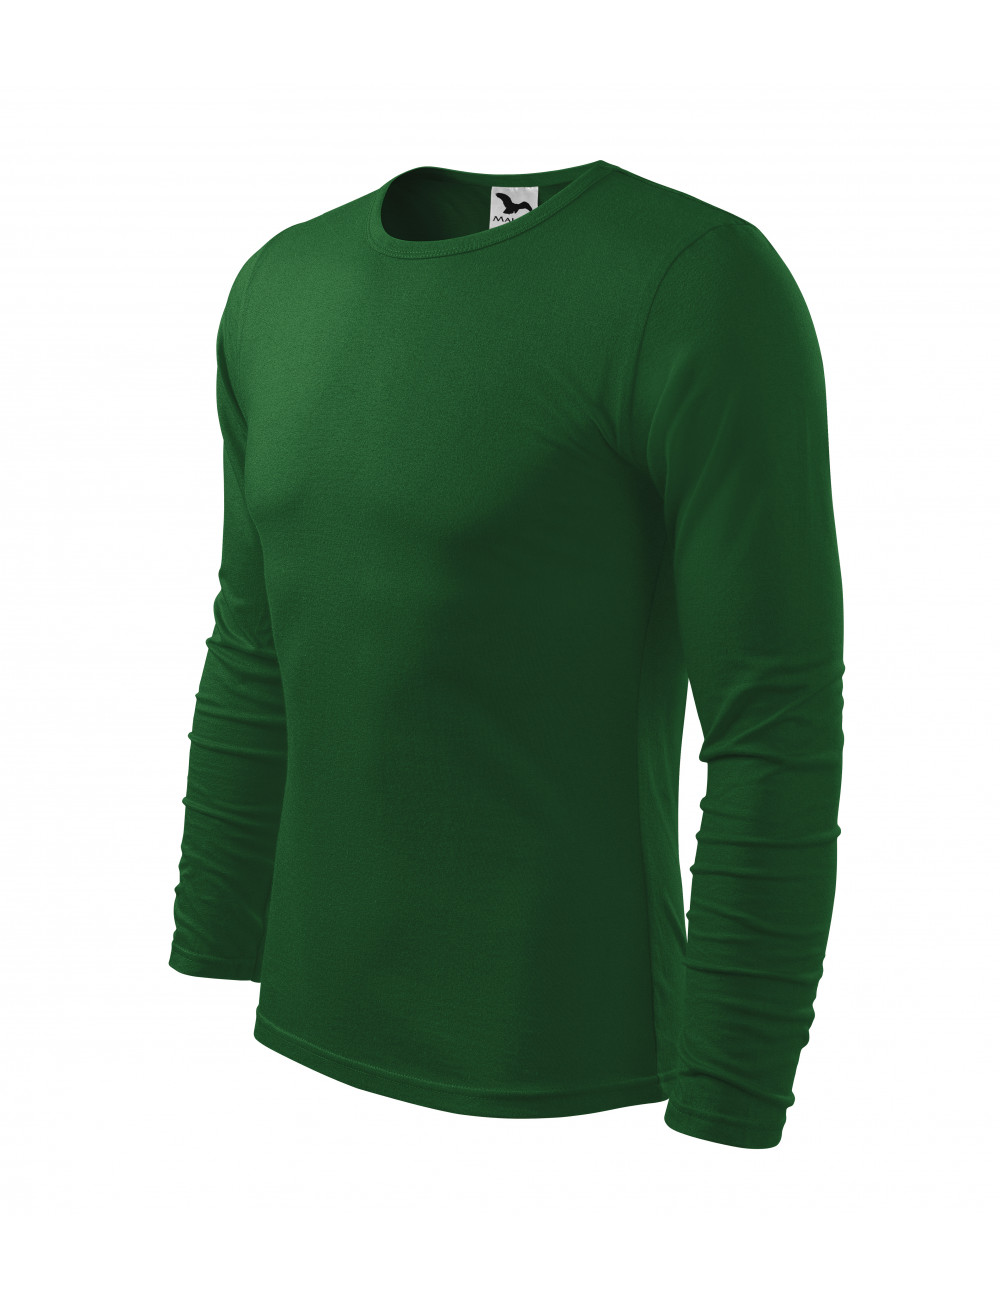 Adler MALFINI Koszulka męska Fit-T Long Sleeve 119 zieleń butelkowa